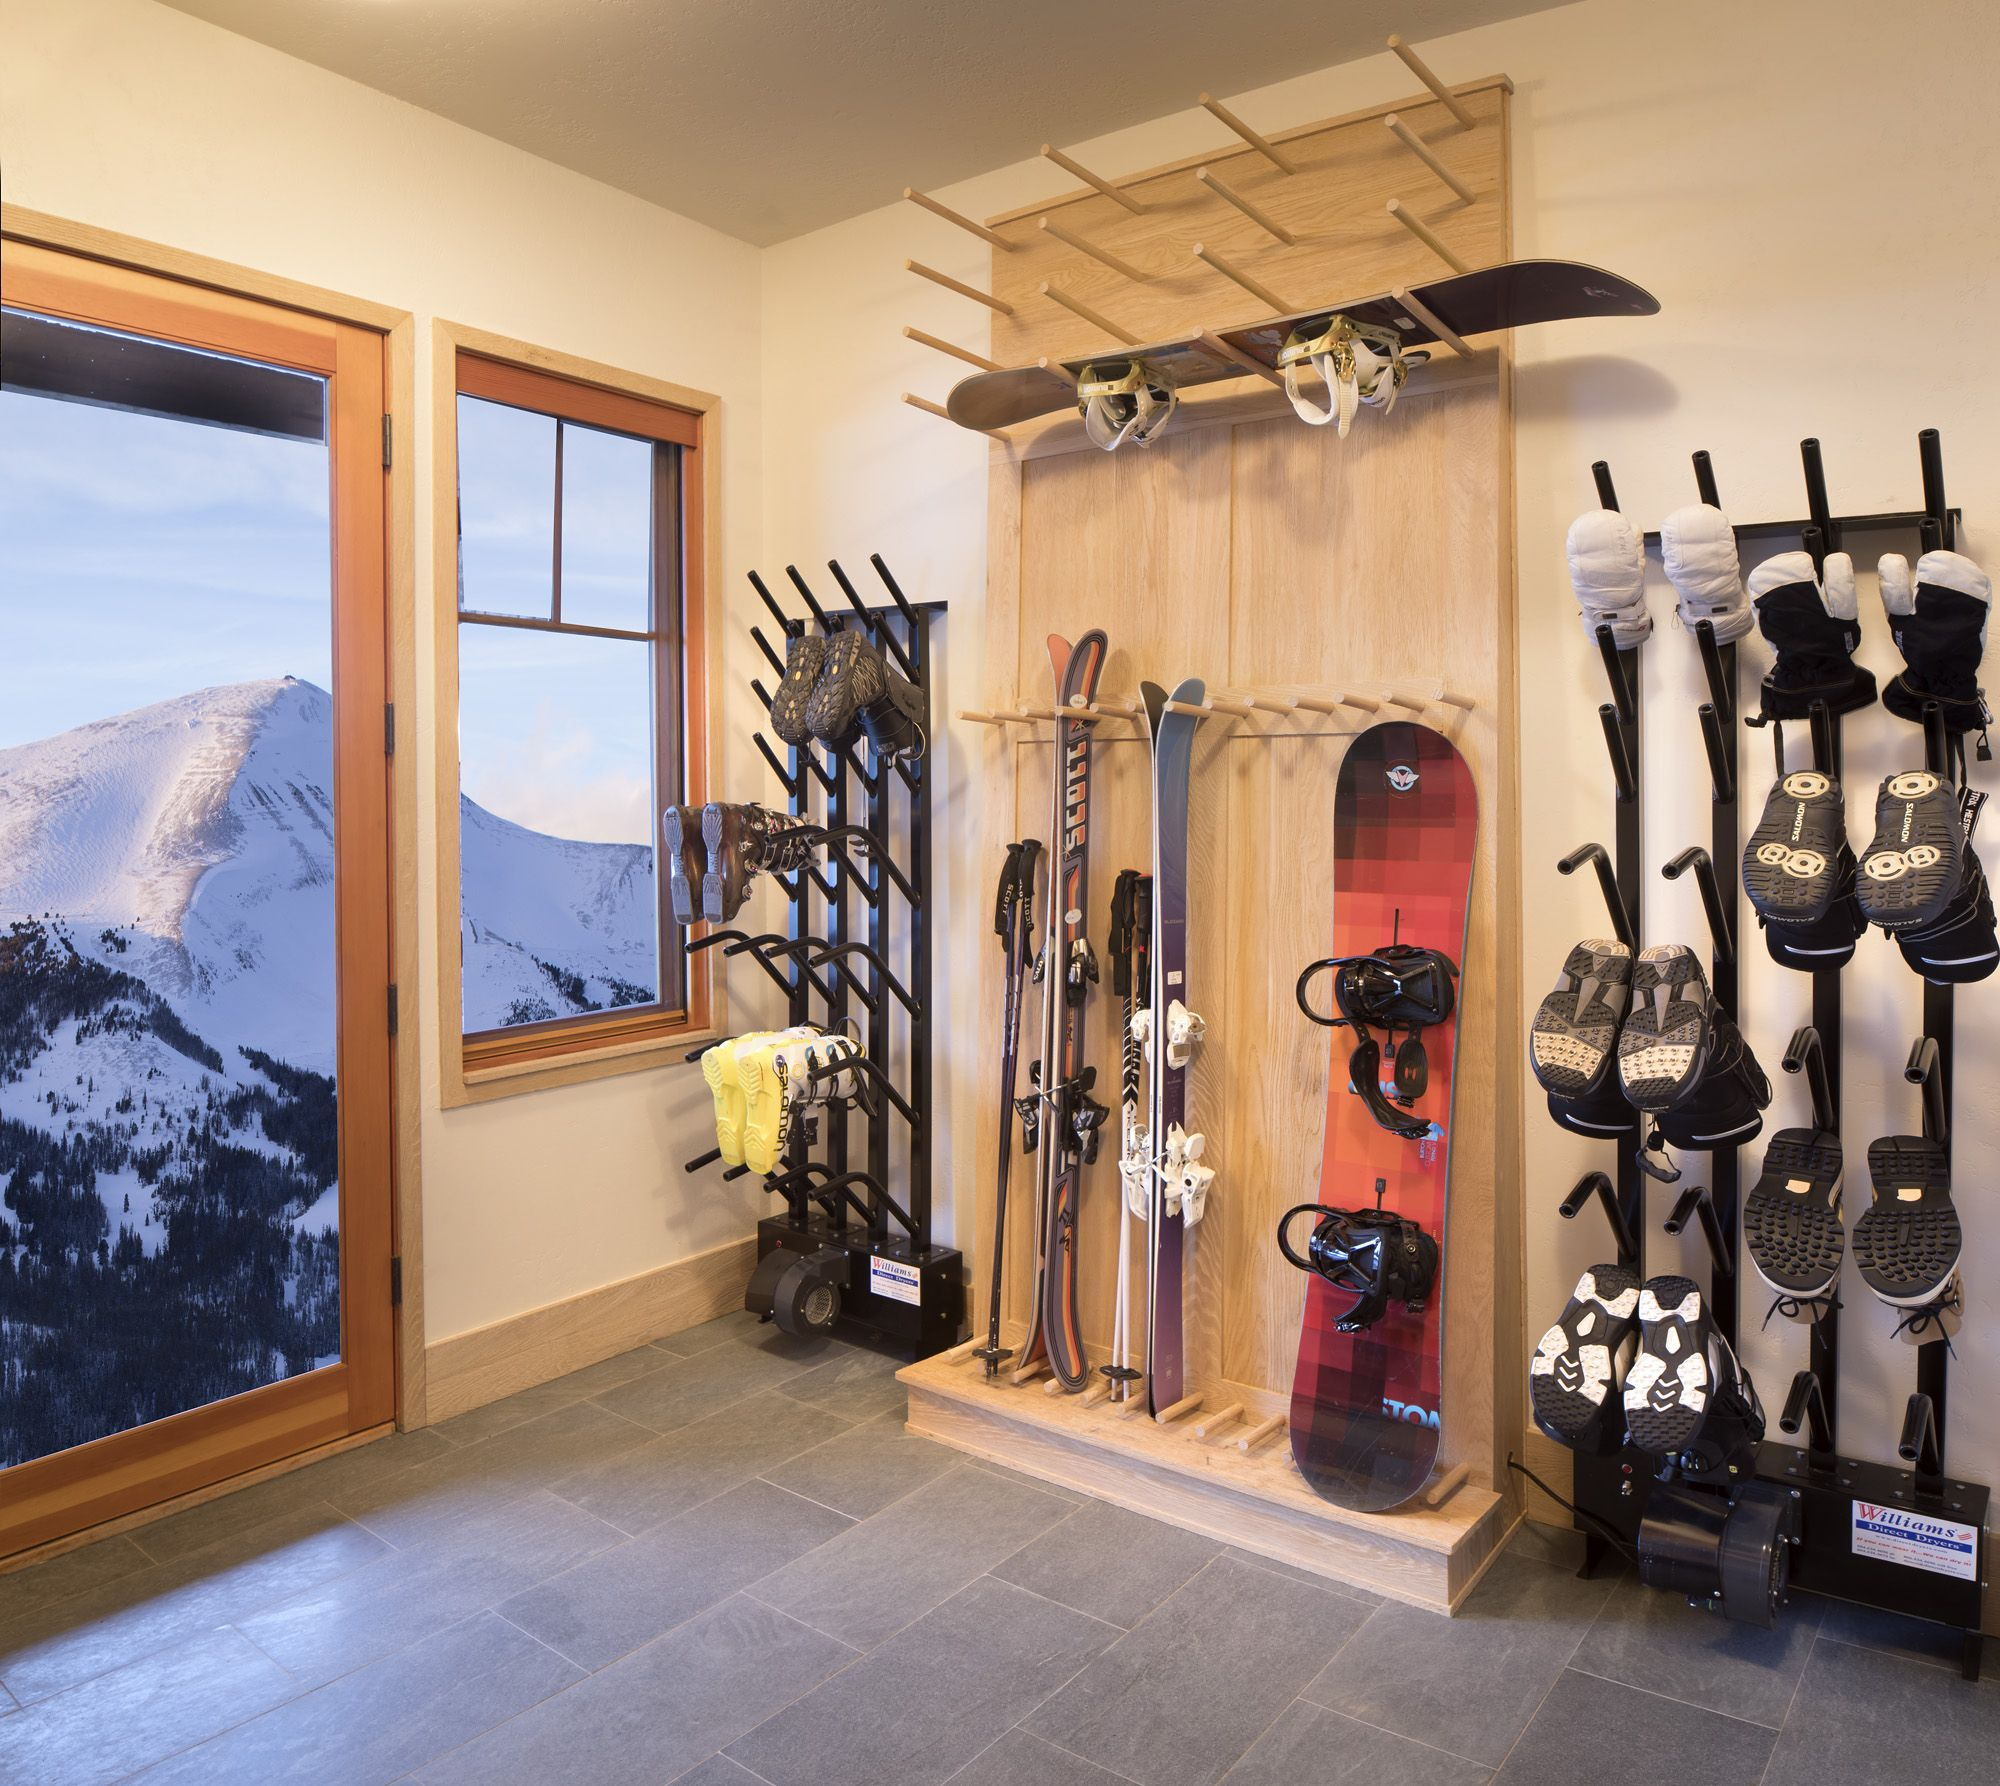 Christmas Mountain Skiing 2020 Ski Boot & Glove Dryers in 2020 | Mountain interiors, Snowboard